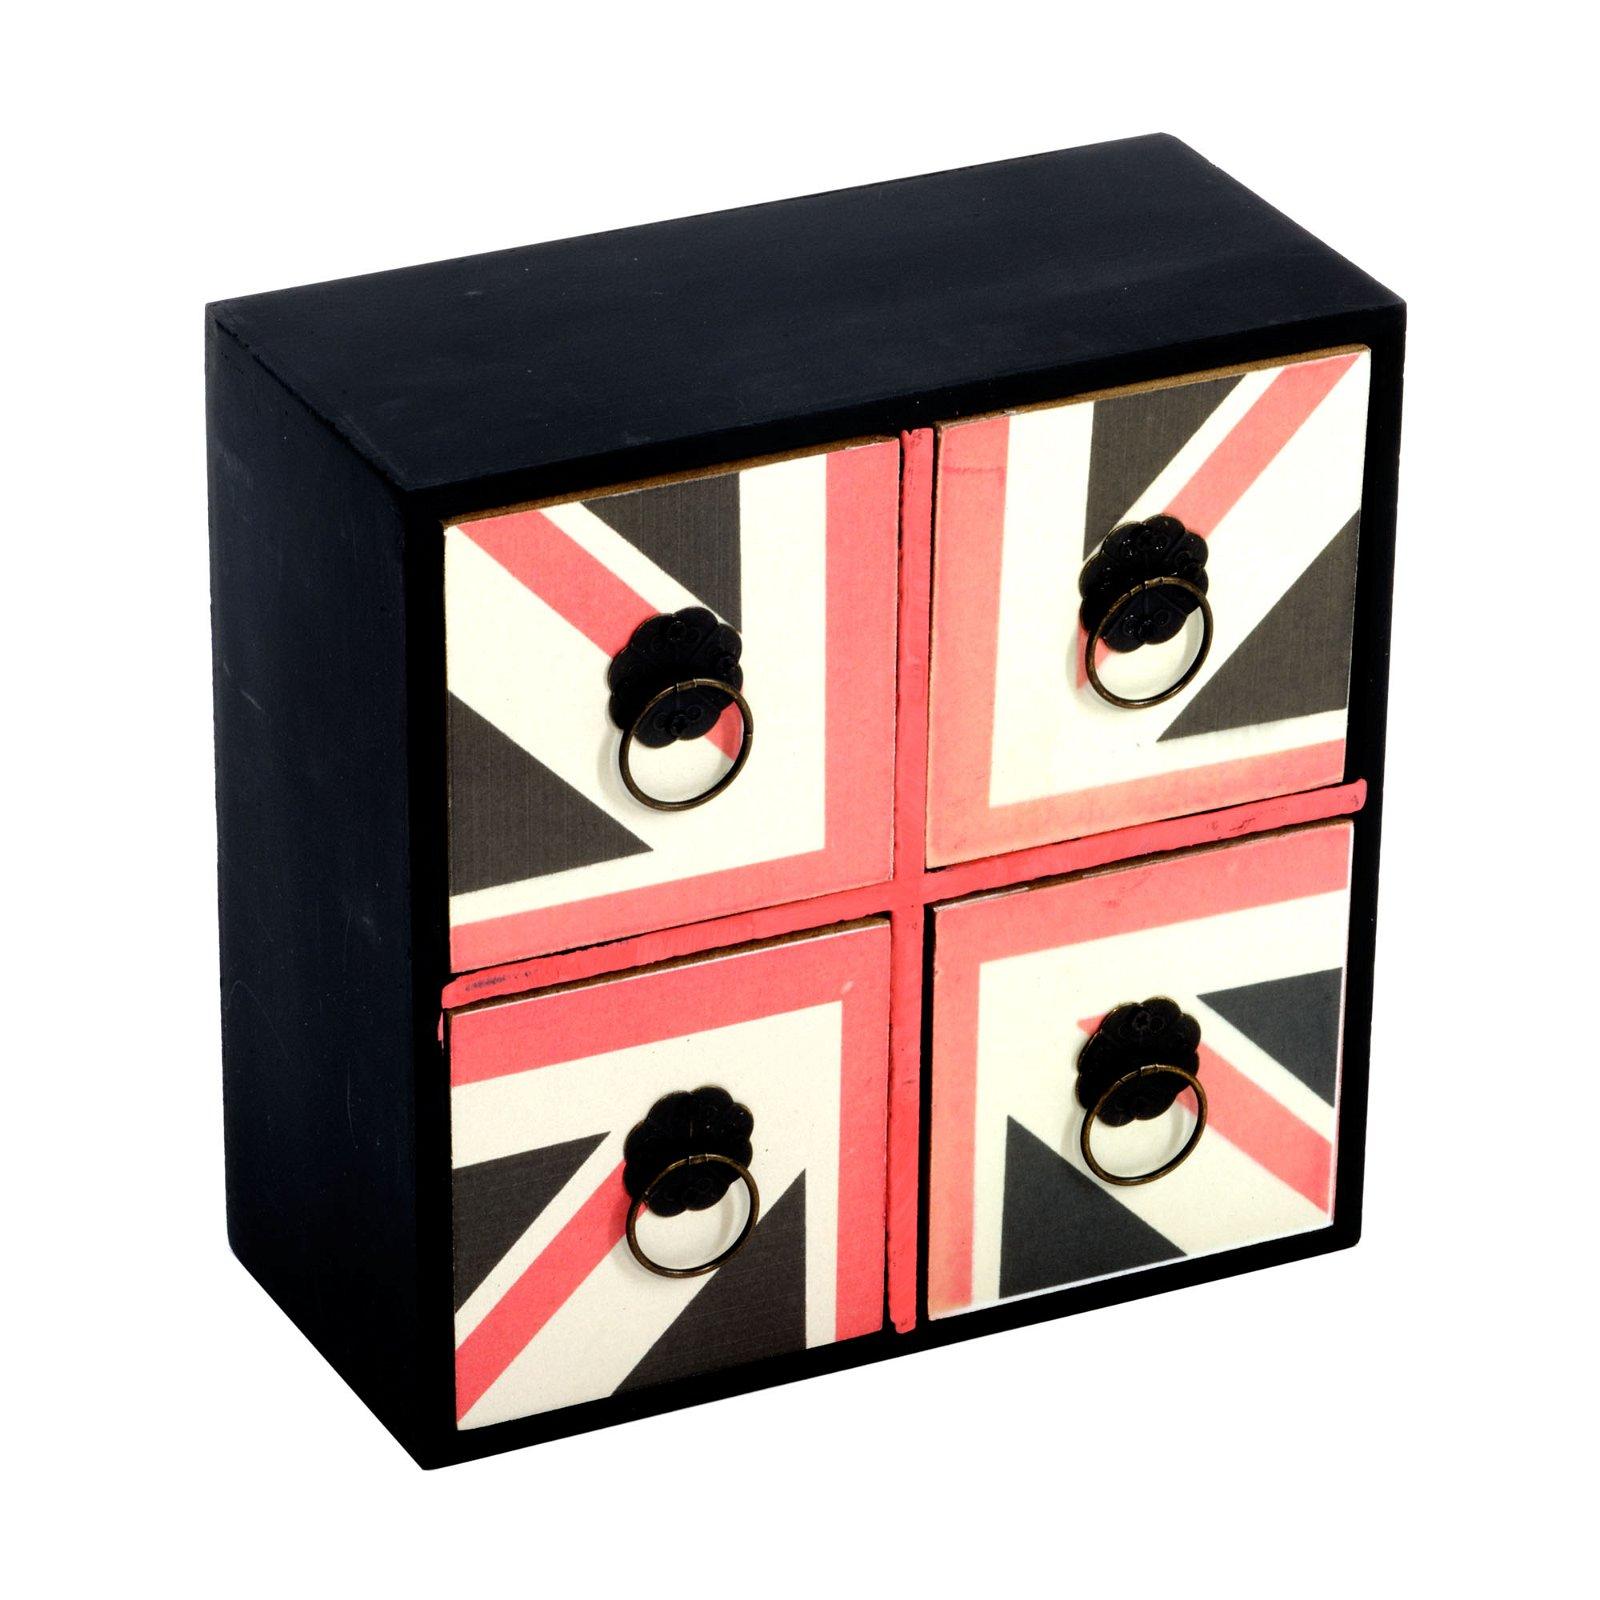 Office Organiser, Set of 4 Drawers Union Jack Design